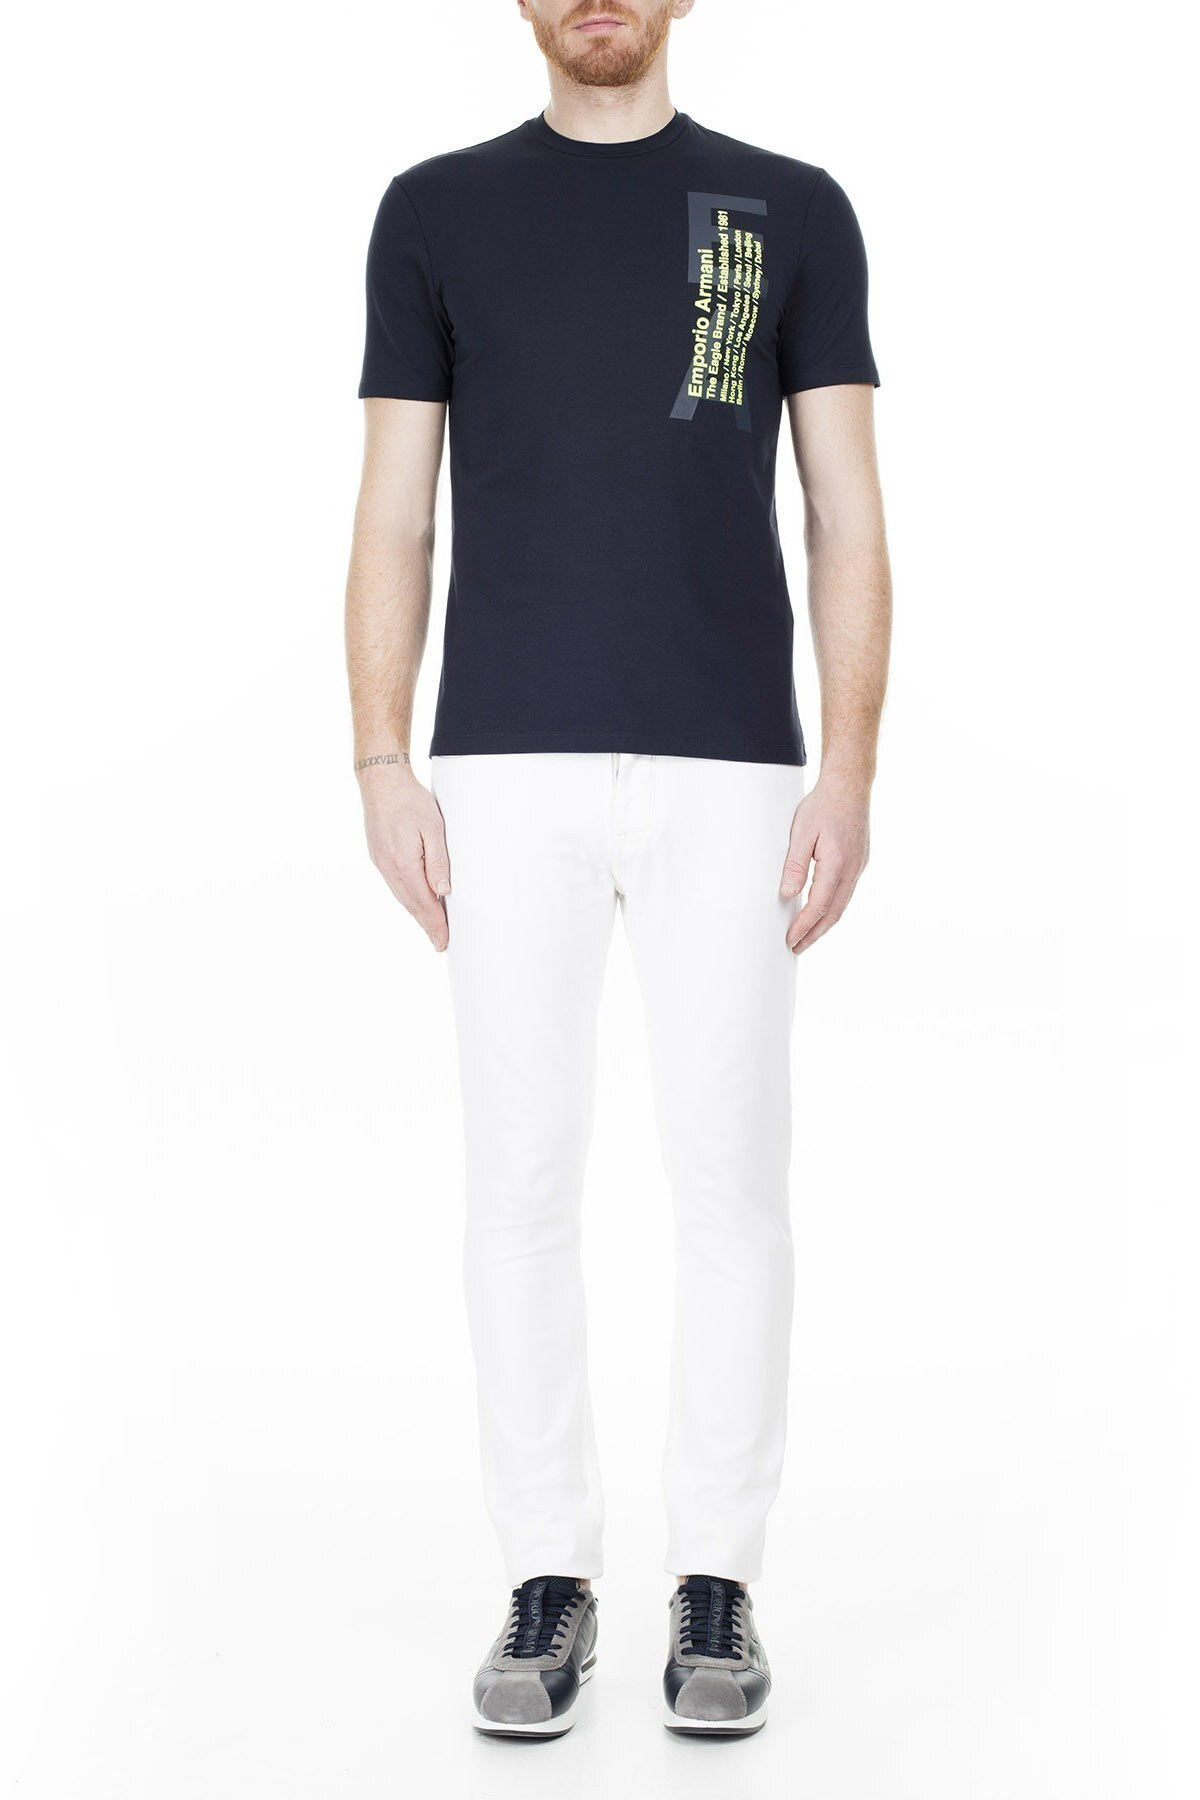 Emporio Armani Erkek T Shirt 3H1T92 1J0AZ 0922 LACİVERT